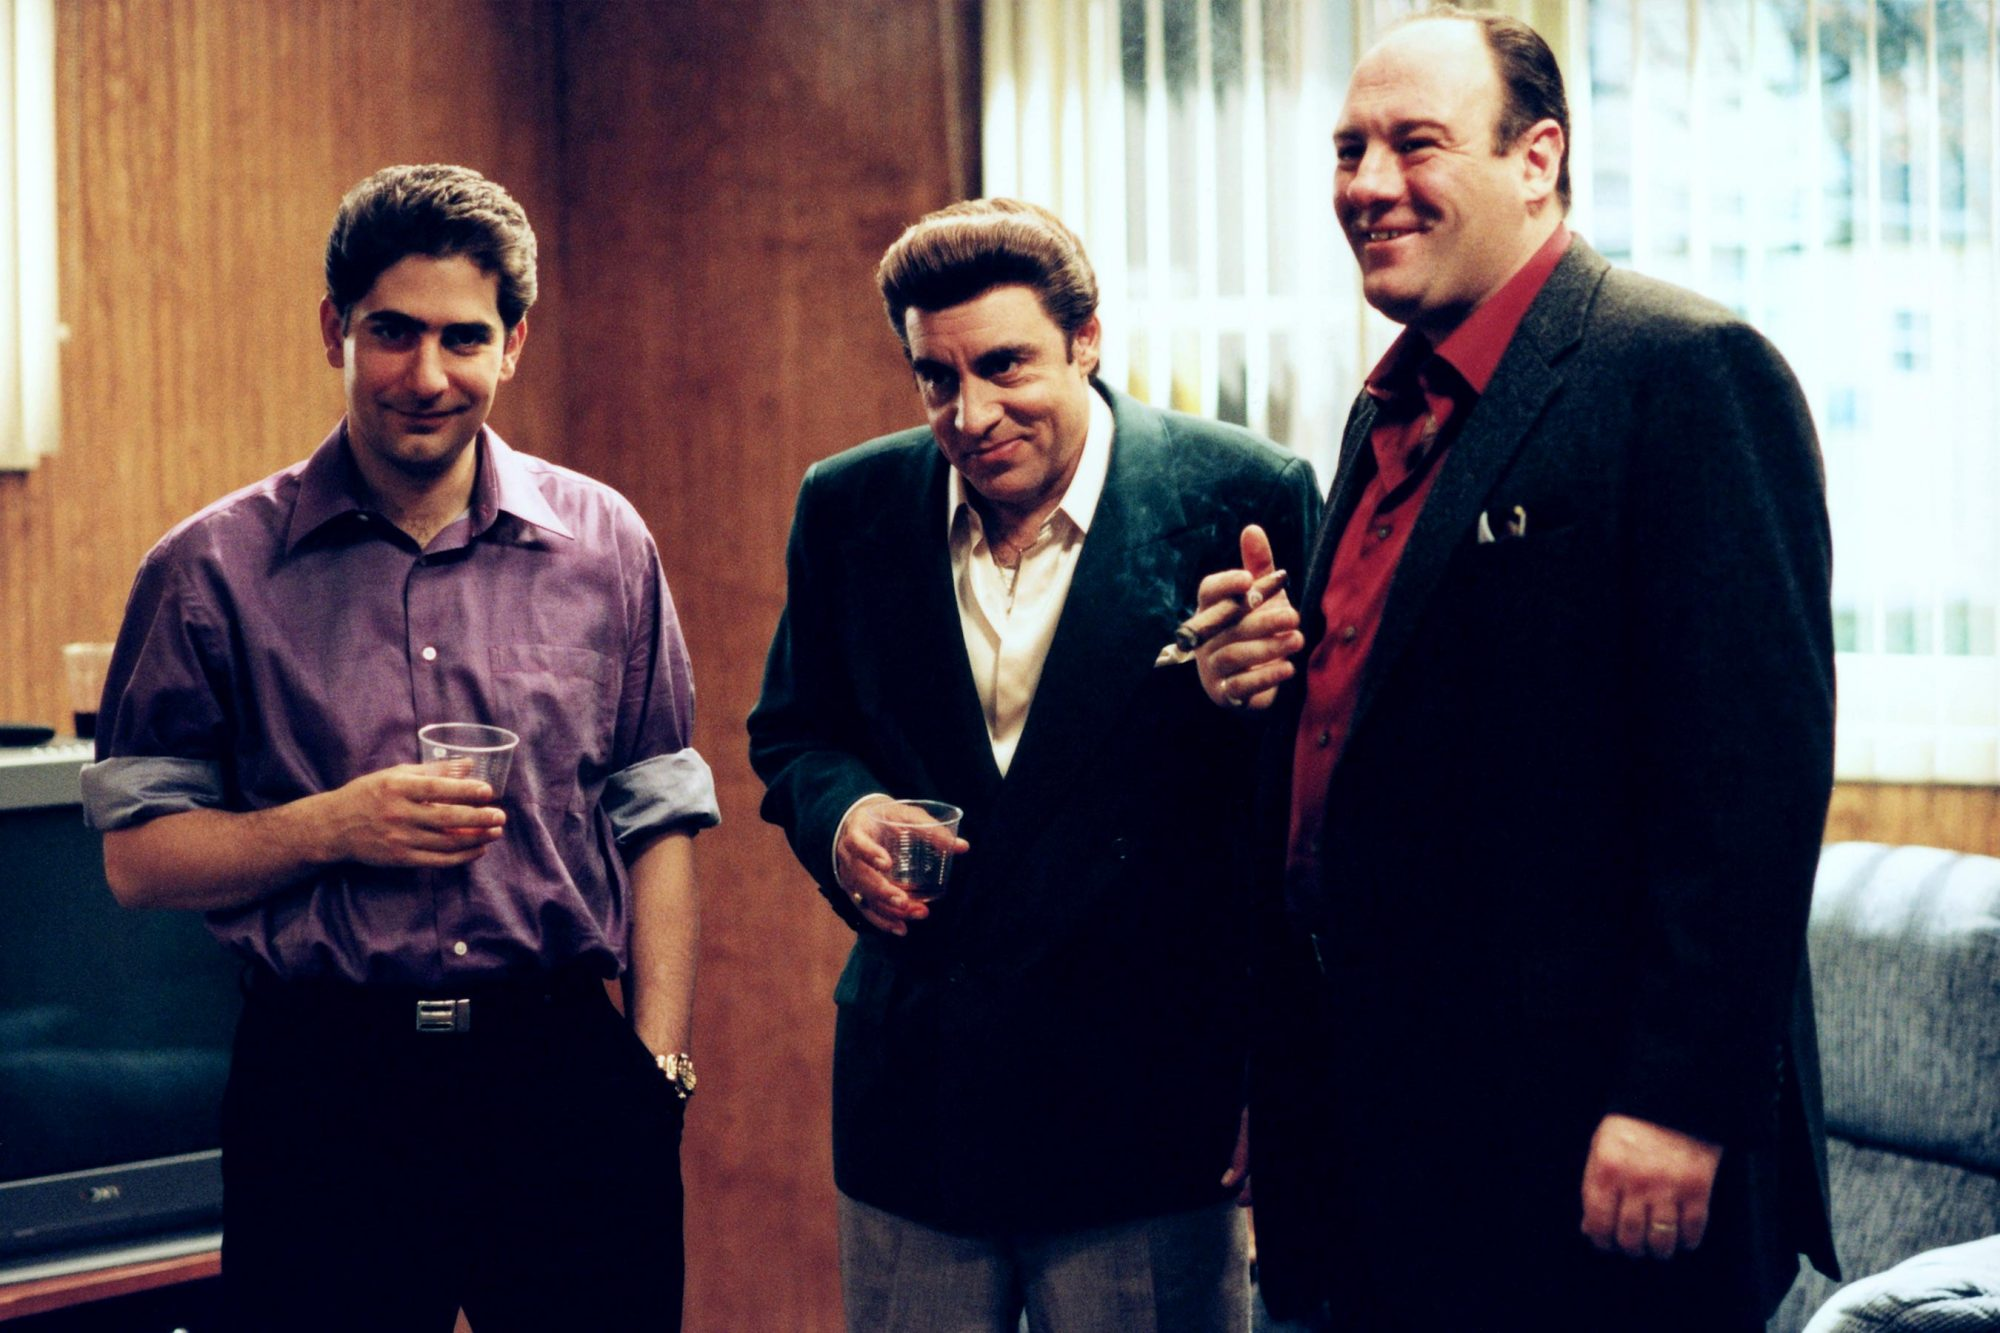 THE SOPRANOS:  Michael Imperioli, Steven Van Zandt, James Gandolfini